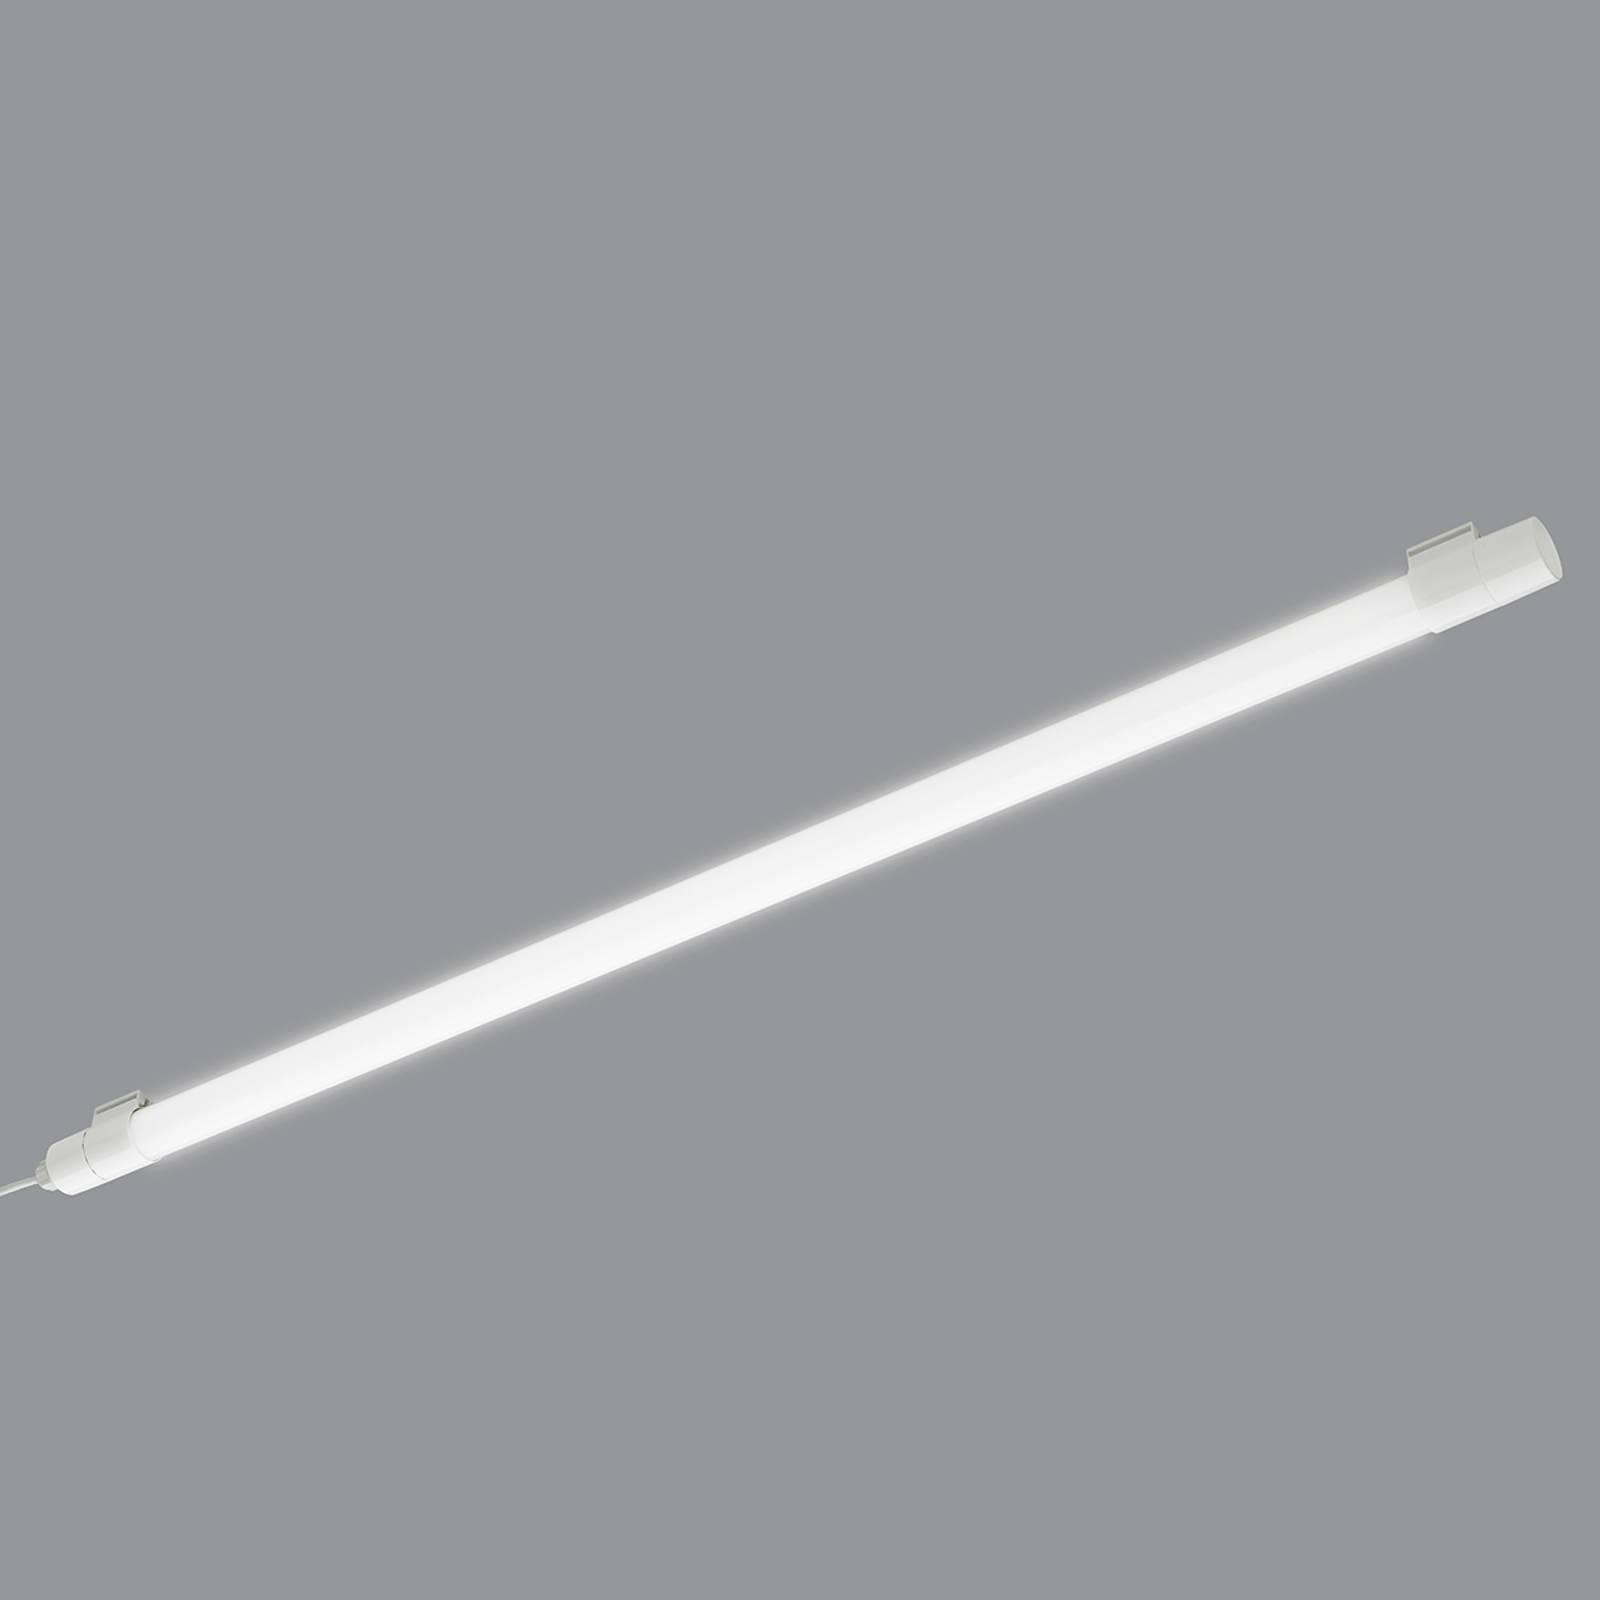 LED-valolista Start Batten IP65, 26 W, 4 000 K